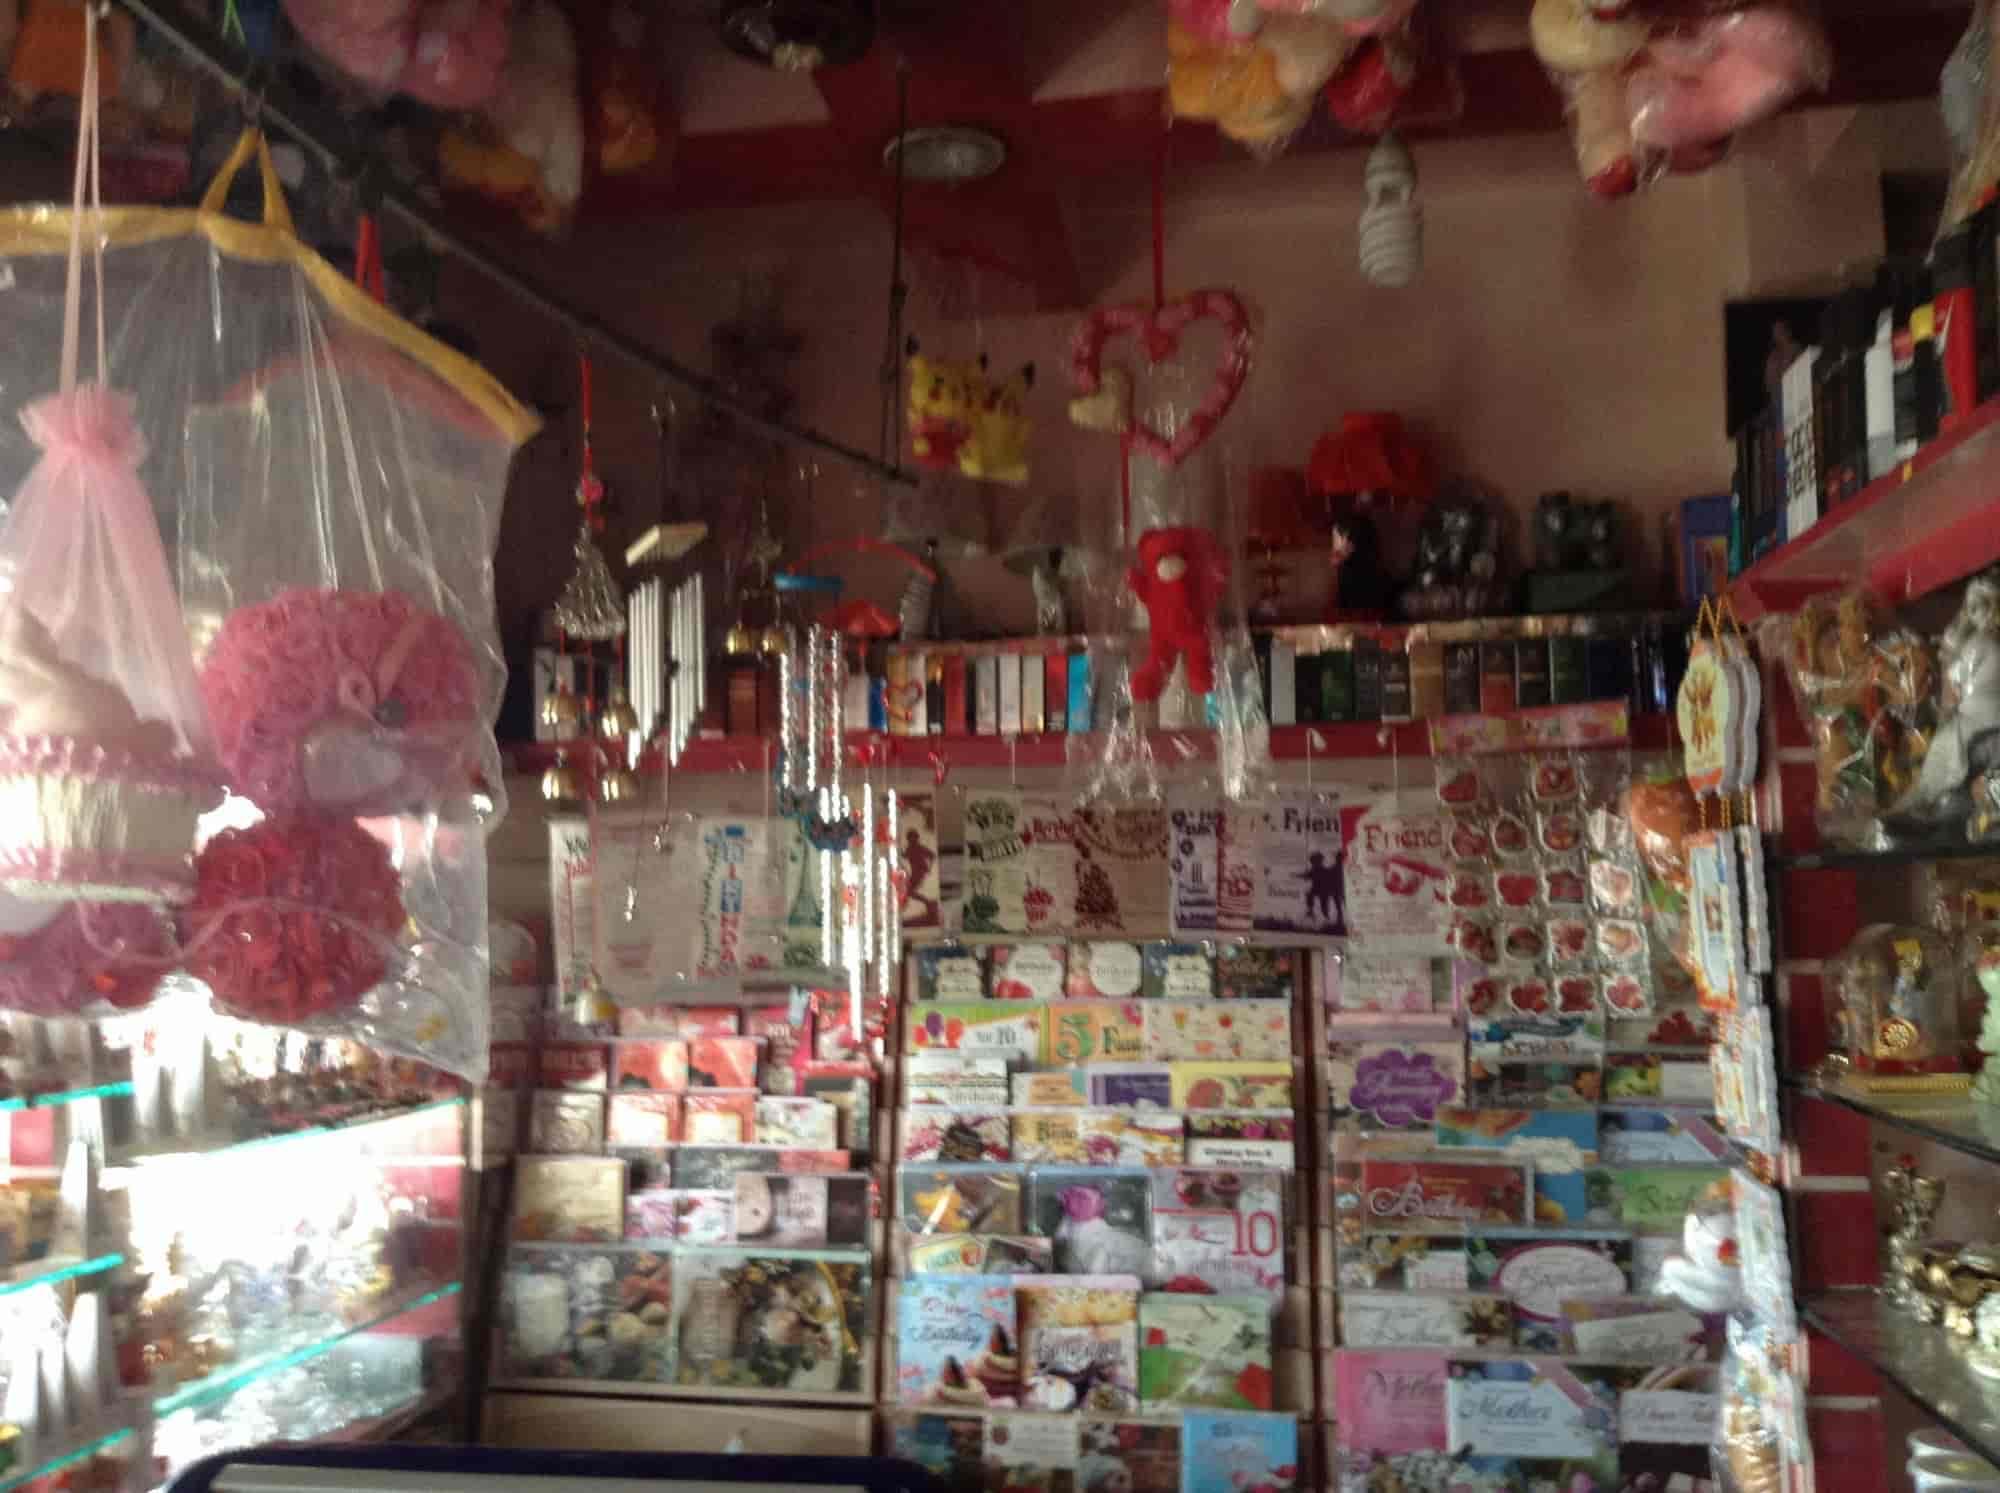 Utsav gifts greetings annapurna road gift shops in indore utsav gifts greetings annapurna road gift shops in indore justdial kristyandbryce Choice Image